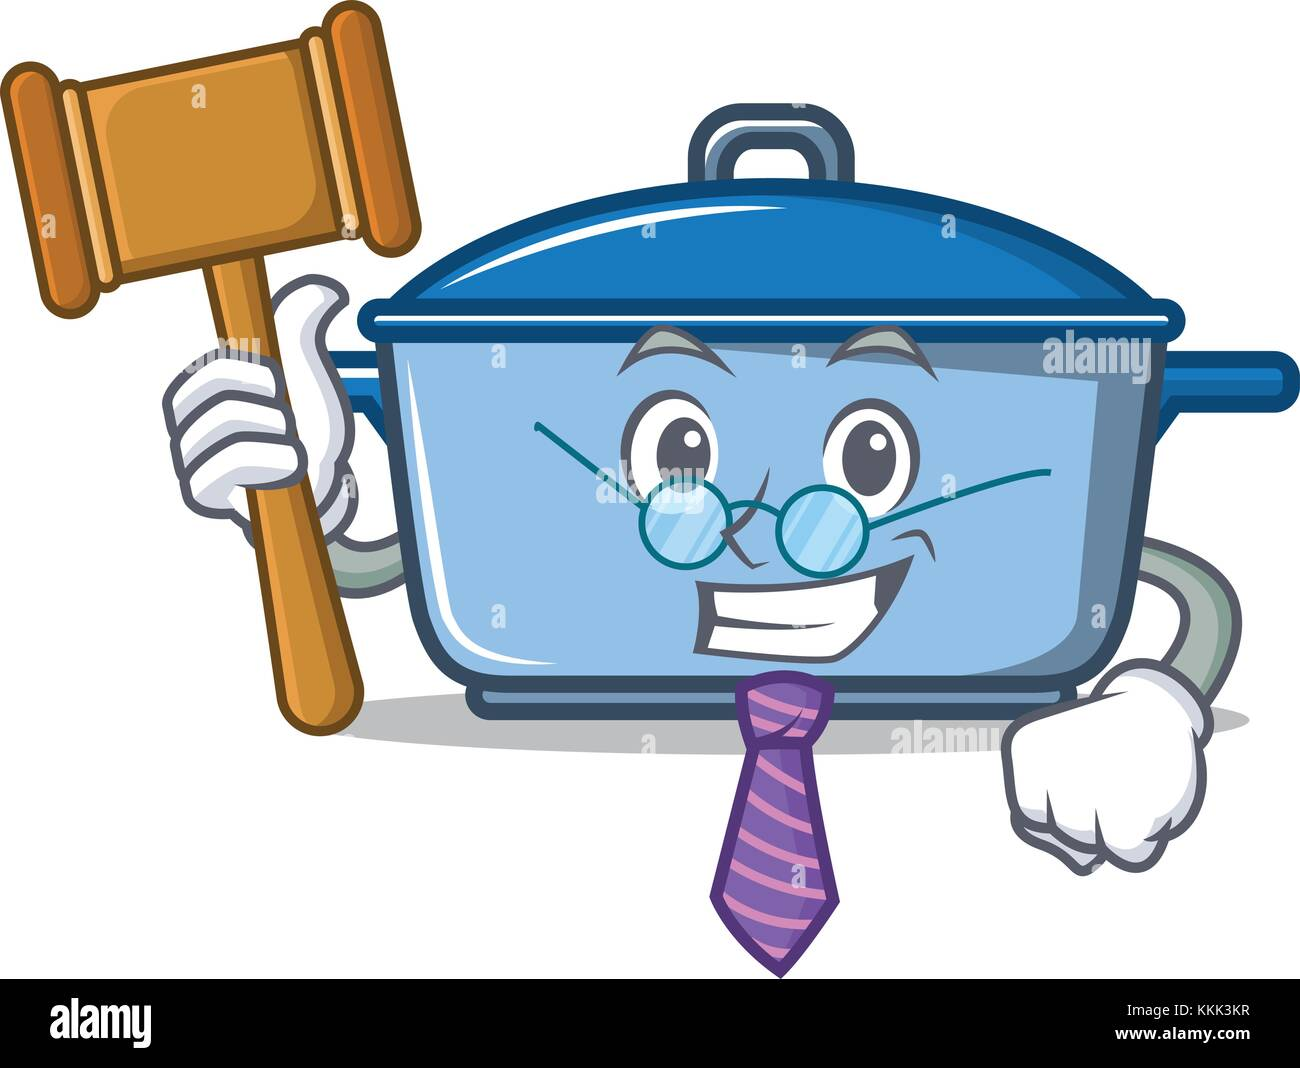 Judge kitchen character cartoon style Stock Vector Art ...